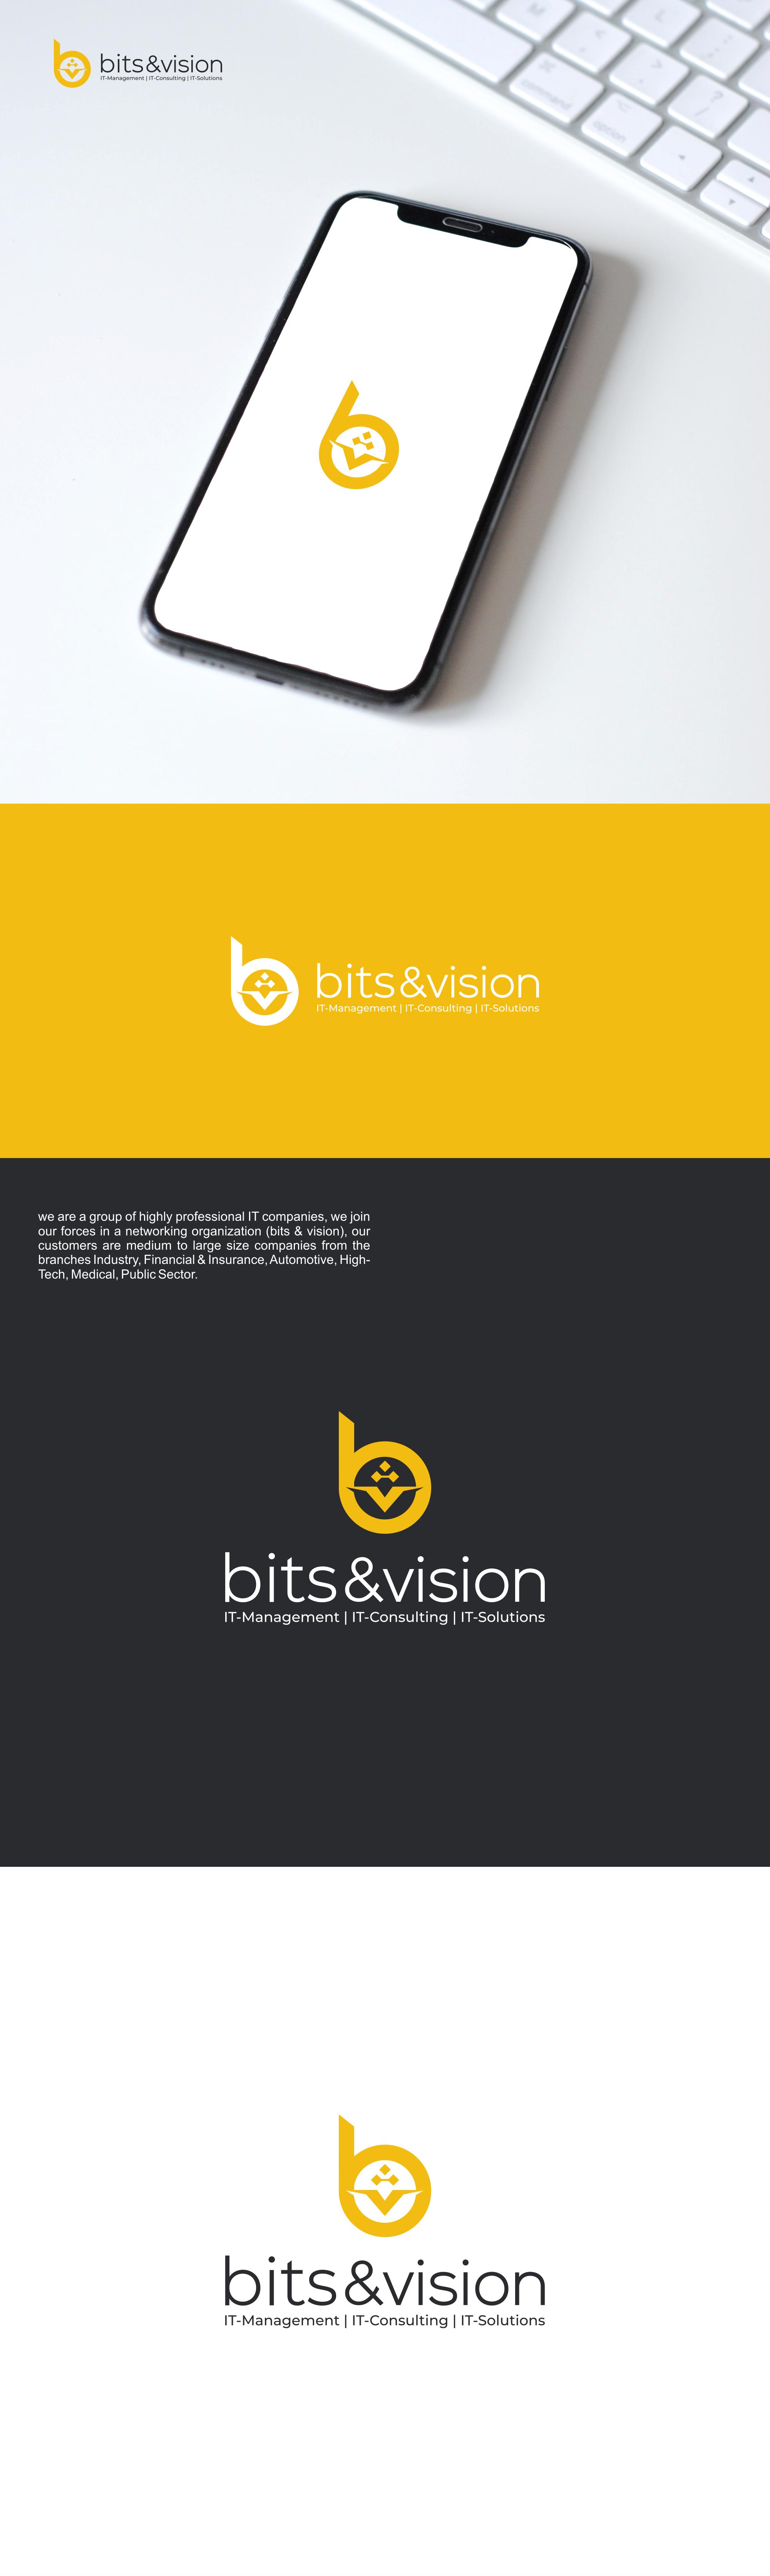 bits & vision logo